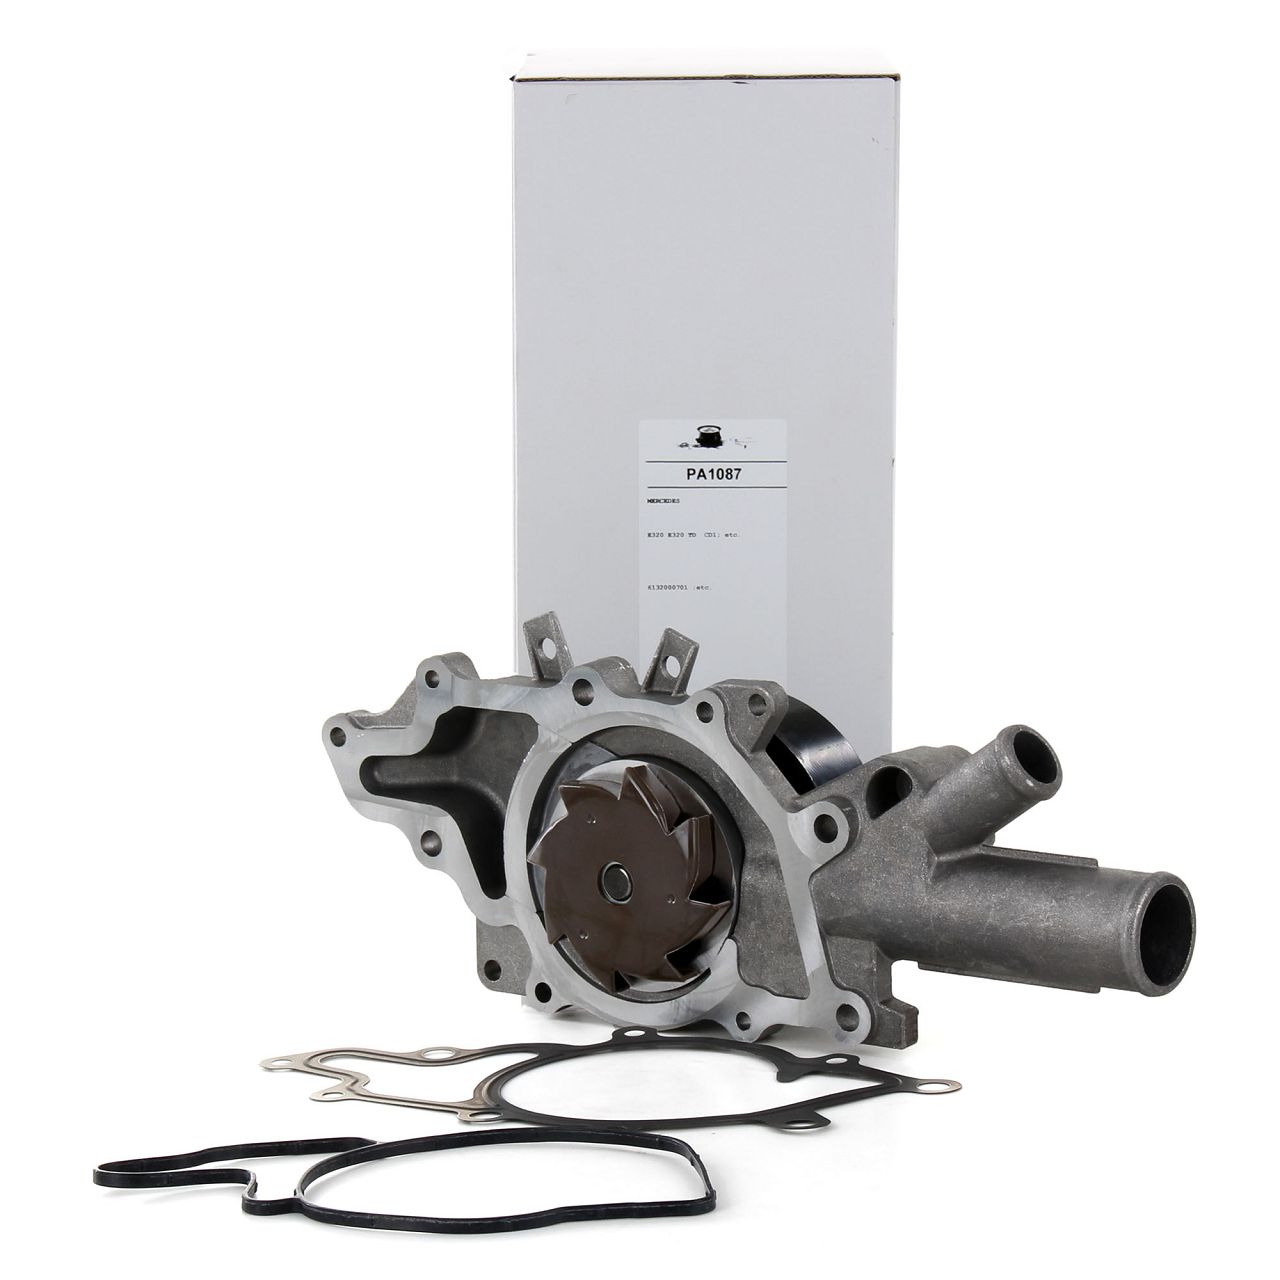 SIL Wasserpumpe Kühlwasserpumpe für MERCEDES E-KLASSE W210 S210 E320CDI 197 PS